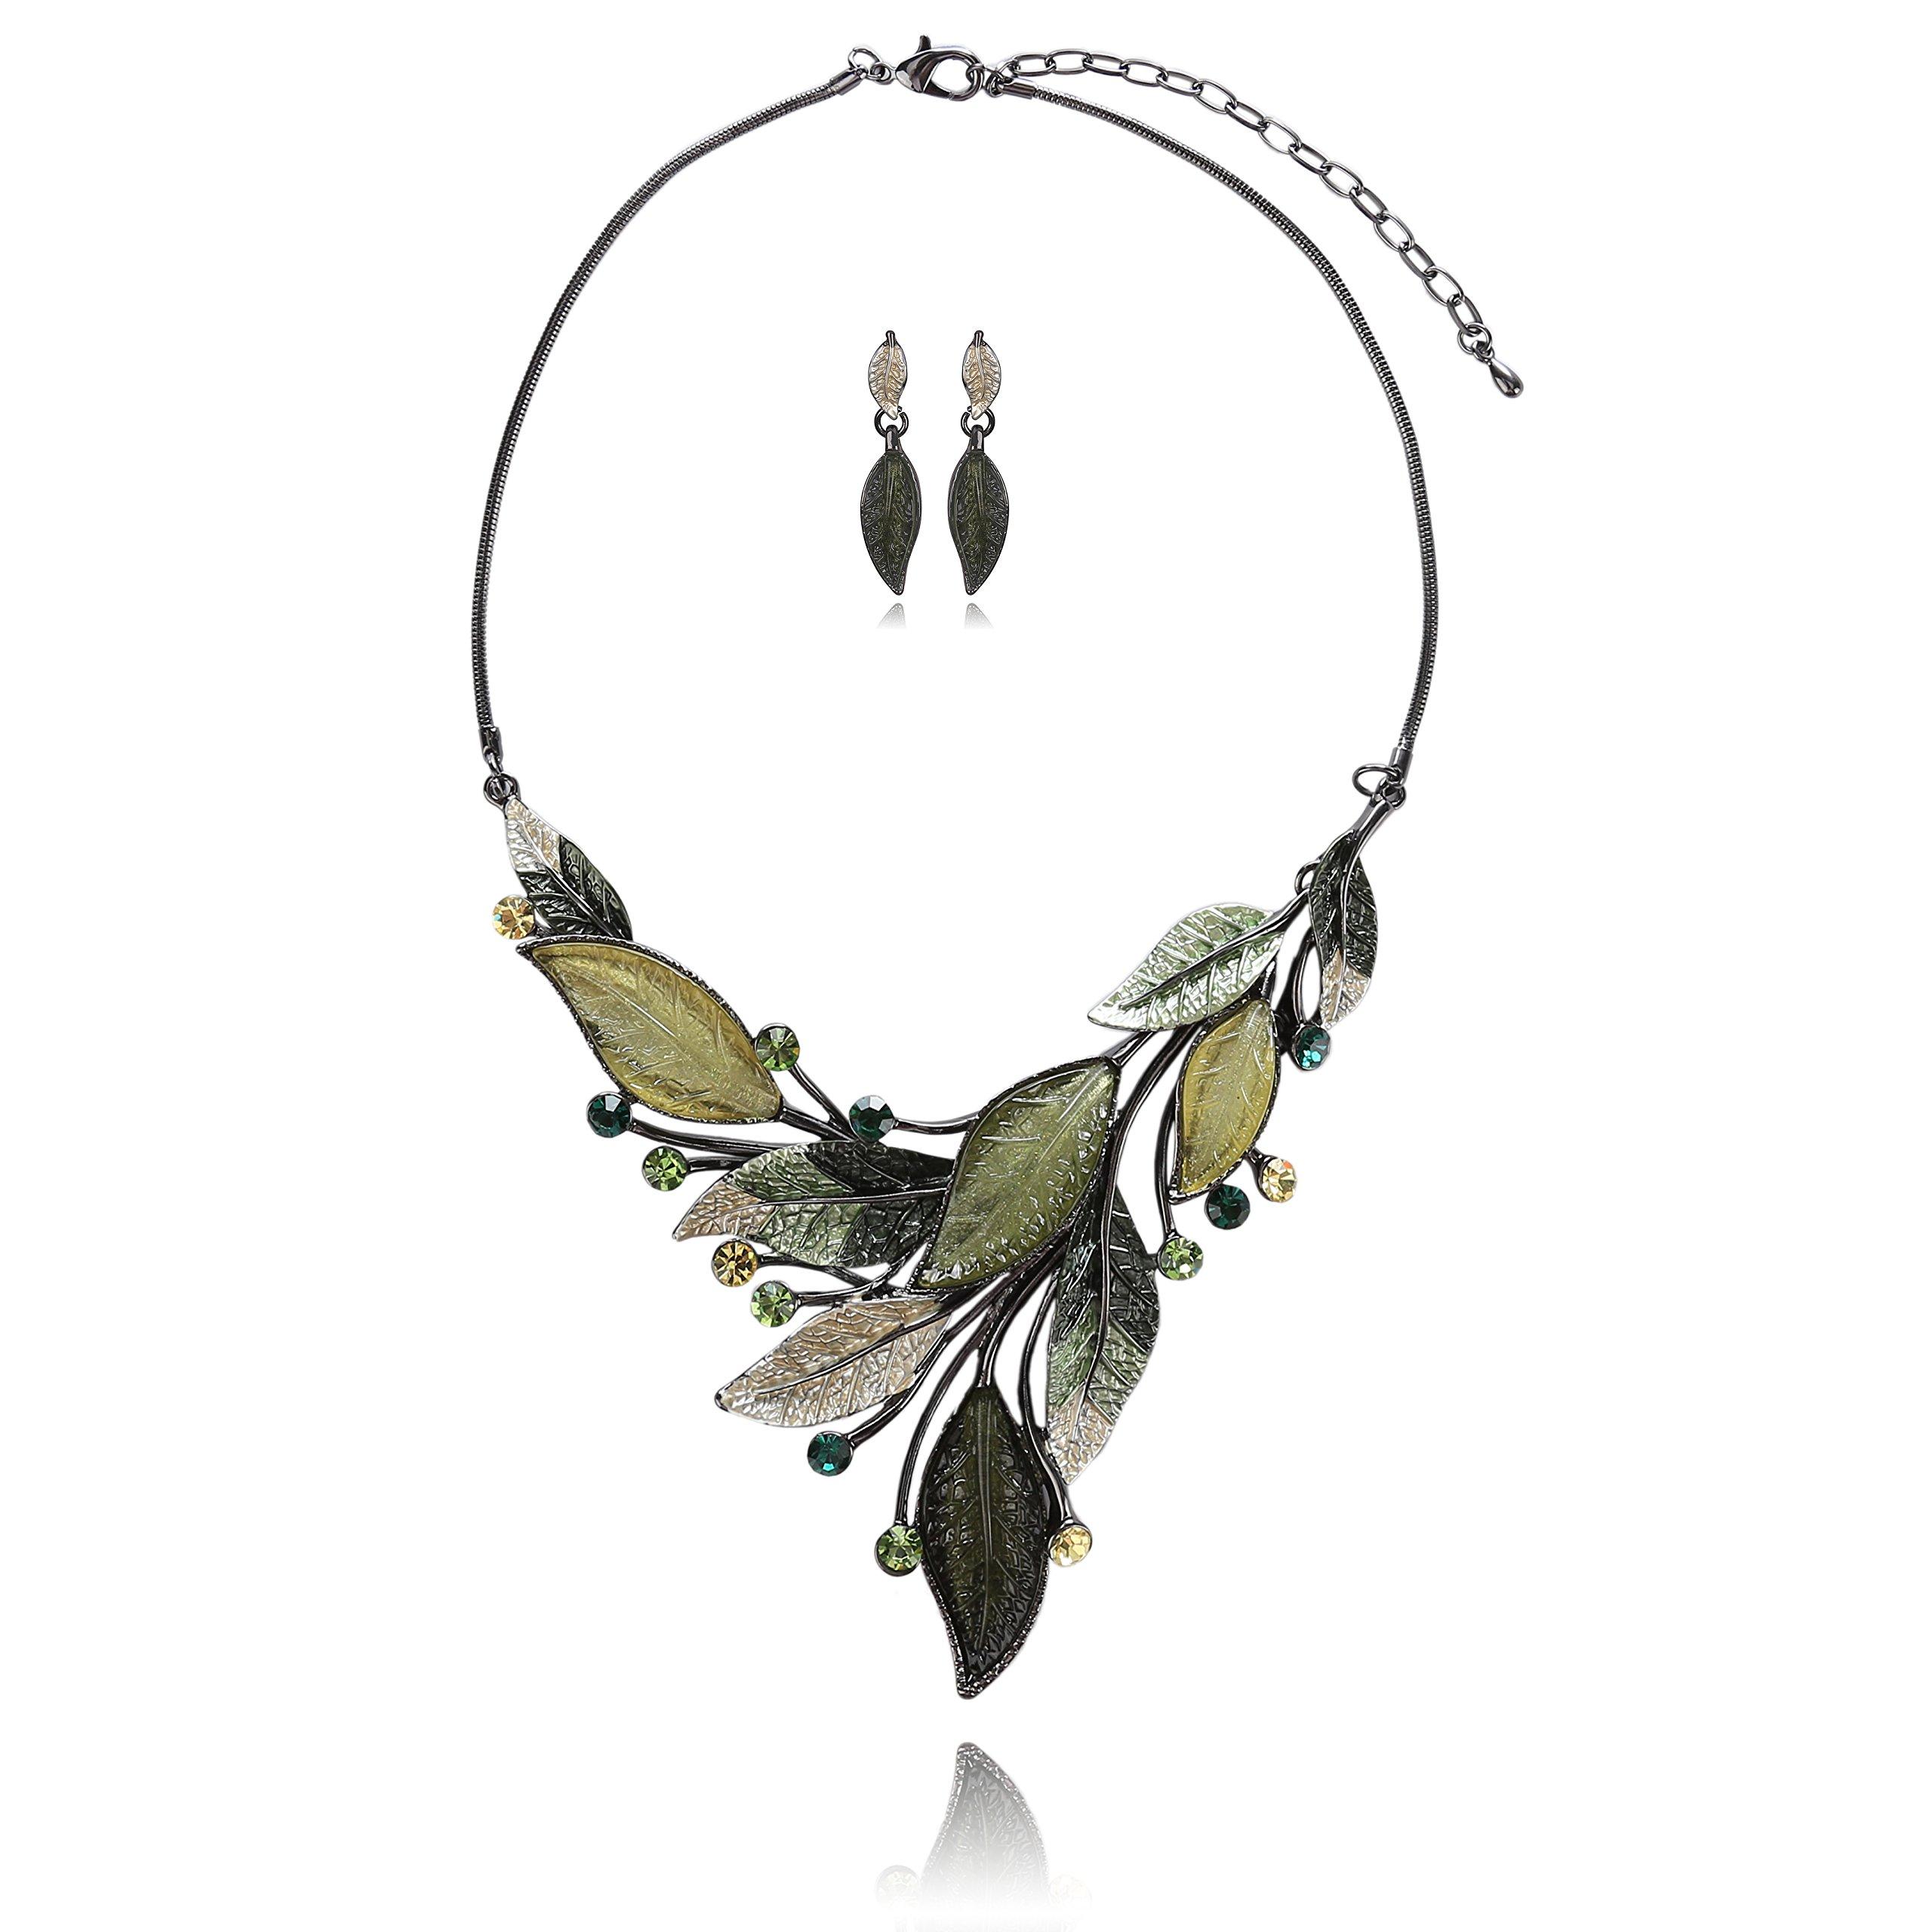 AMYJANE Vintage Statement Necklace Set - Spring Green Leaf Floral Crystal Rhinestone Statement Jewelry Set Fashion Bib Jewelry for Women Weddring Prom Party Elegant Gift Idea